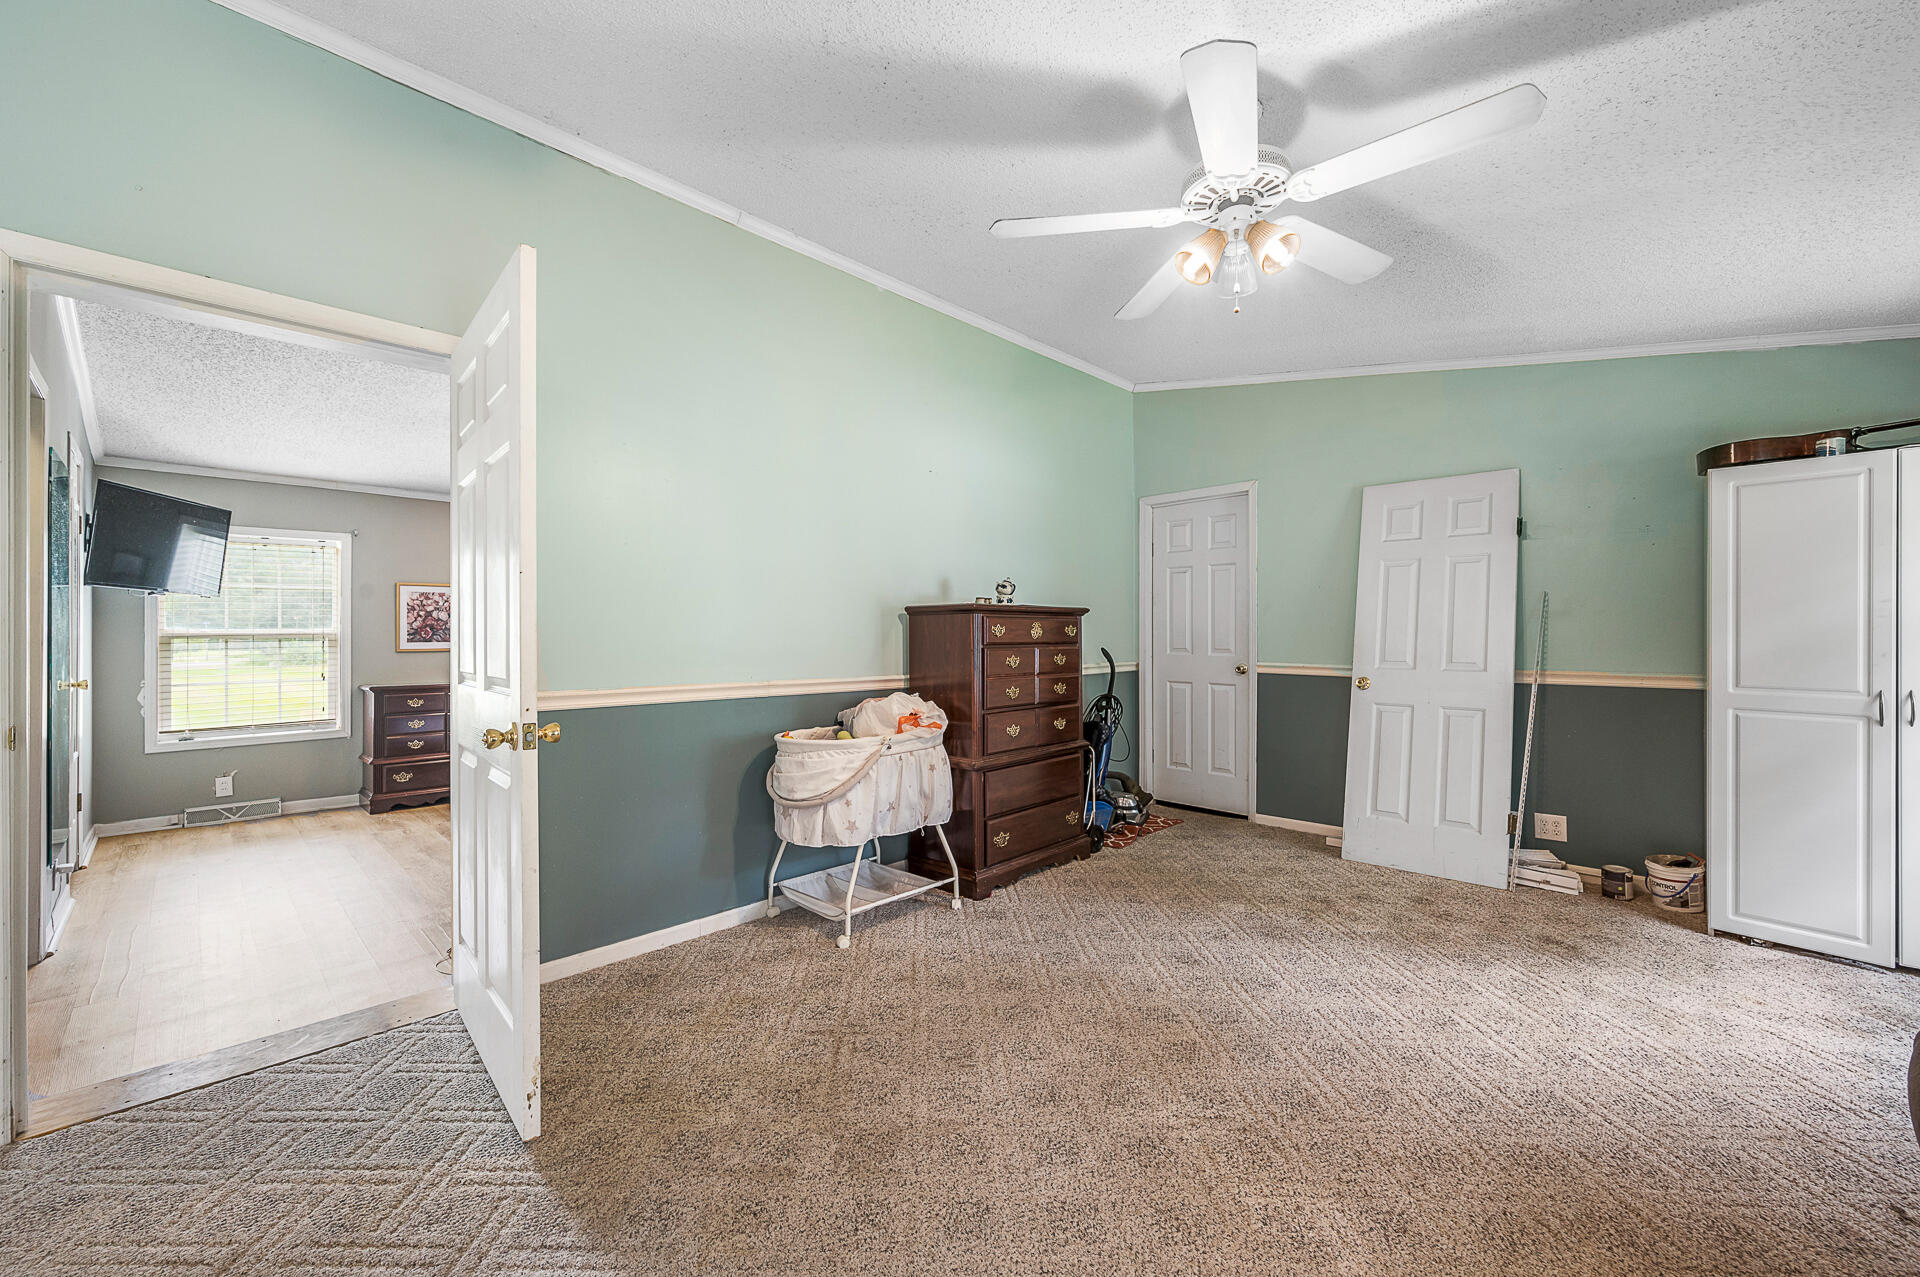 Clemson Terrace Homes For Sale - 250 Medina, Summerville, SC - 9